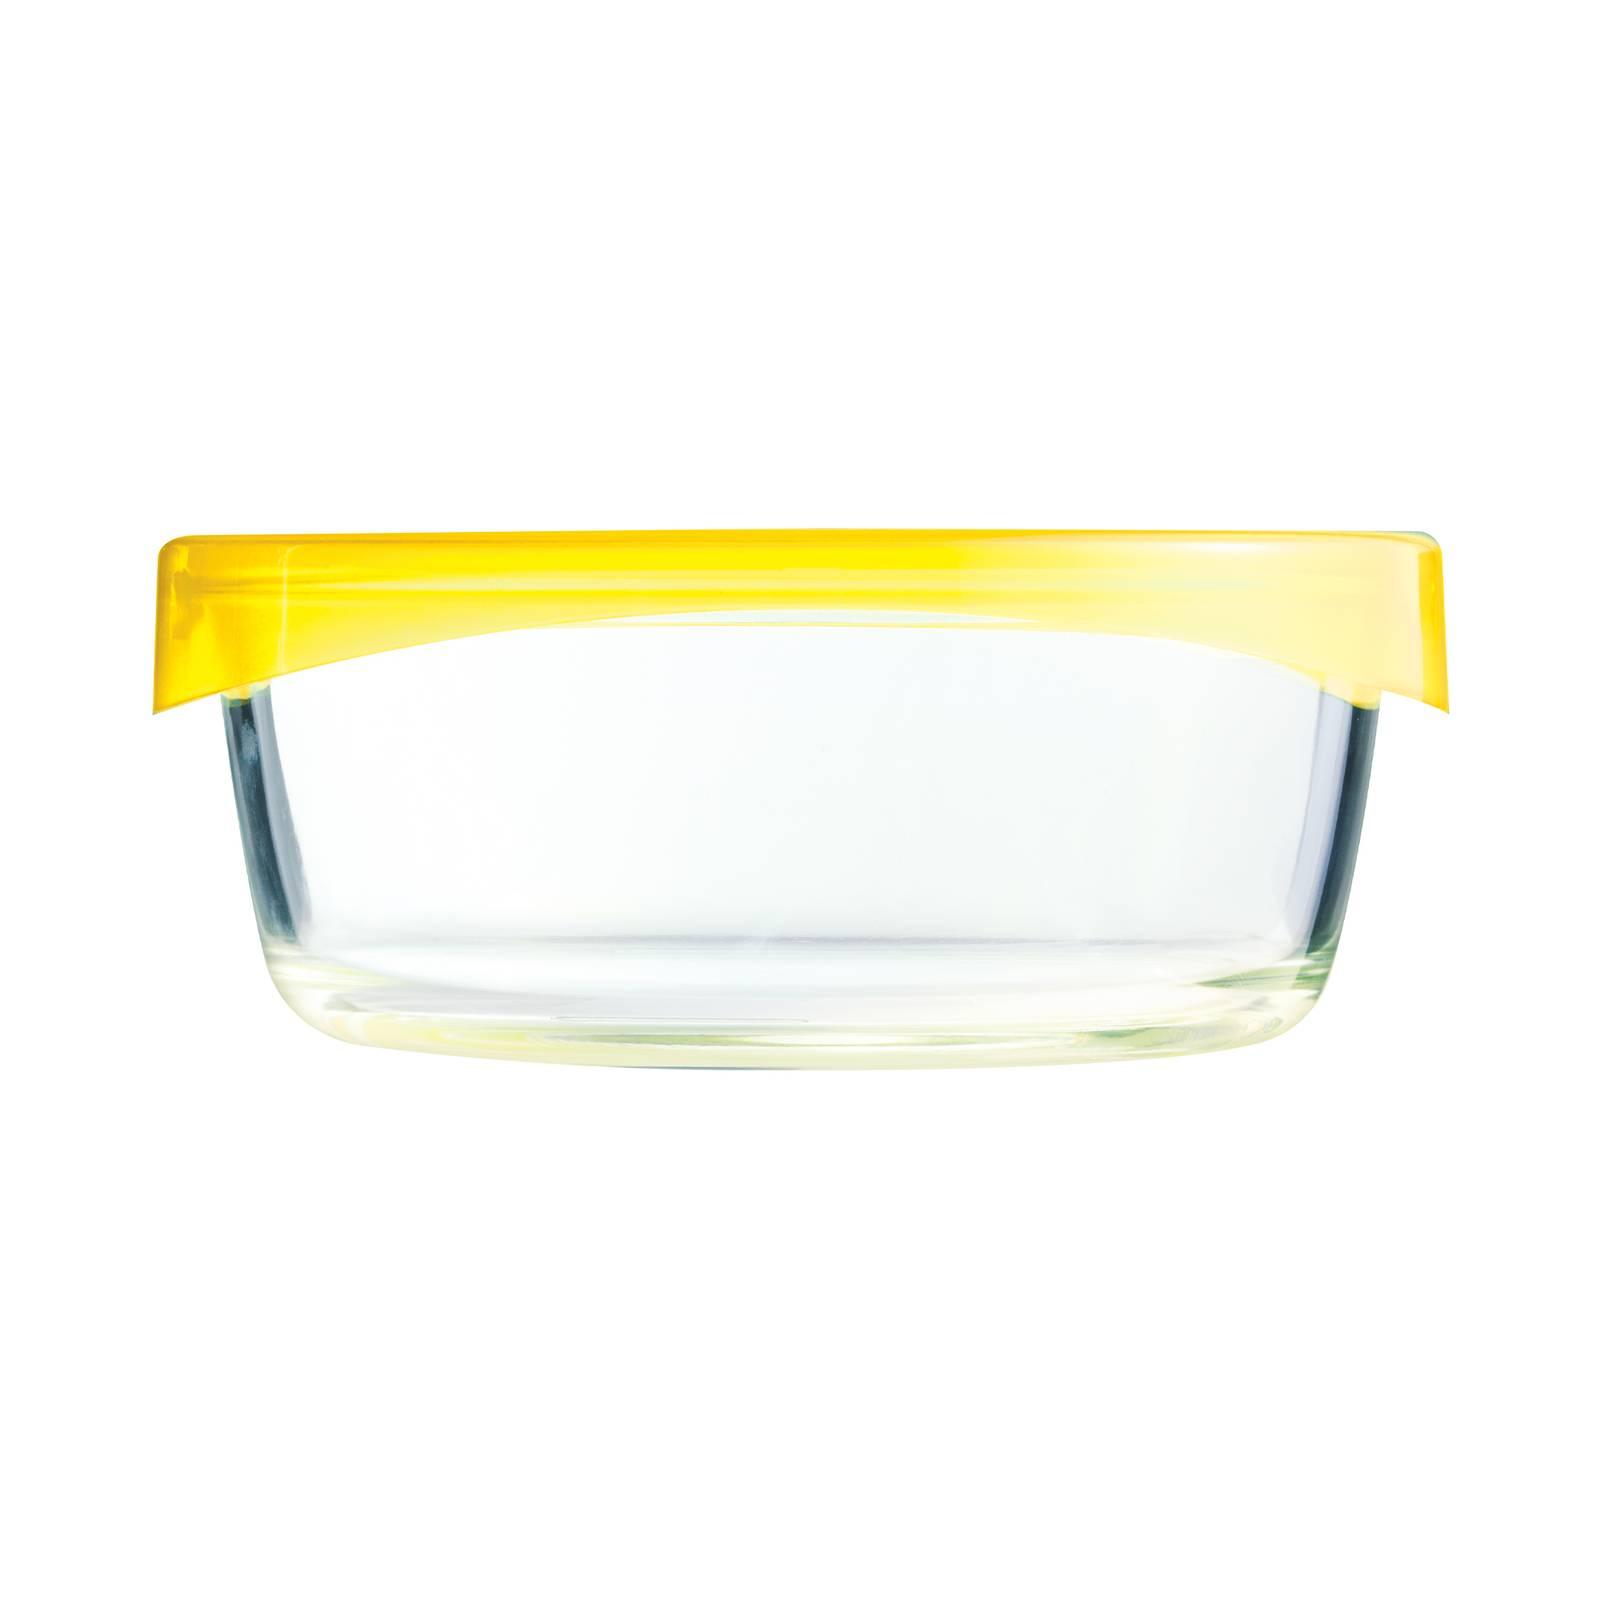 Glasbehälter Keep 'n' Box 630 ml gelb LUMINARC